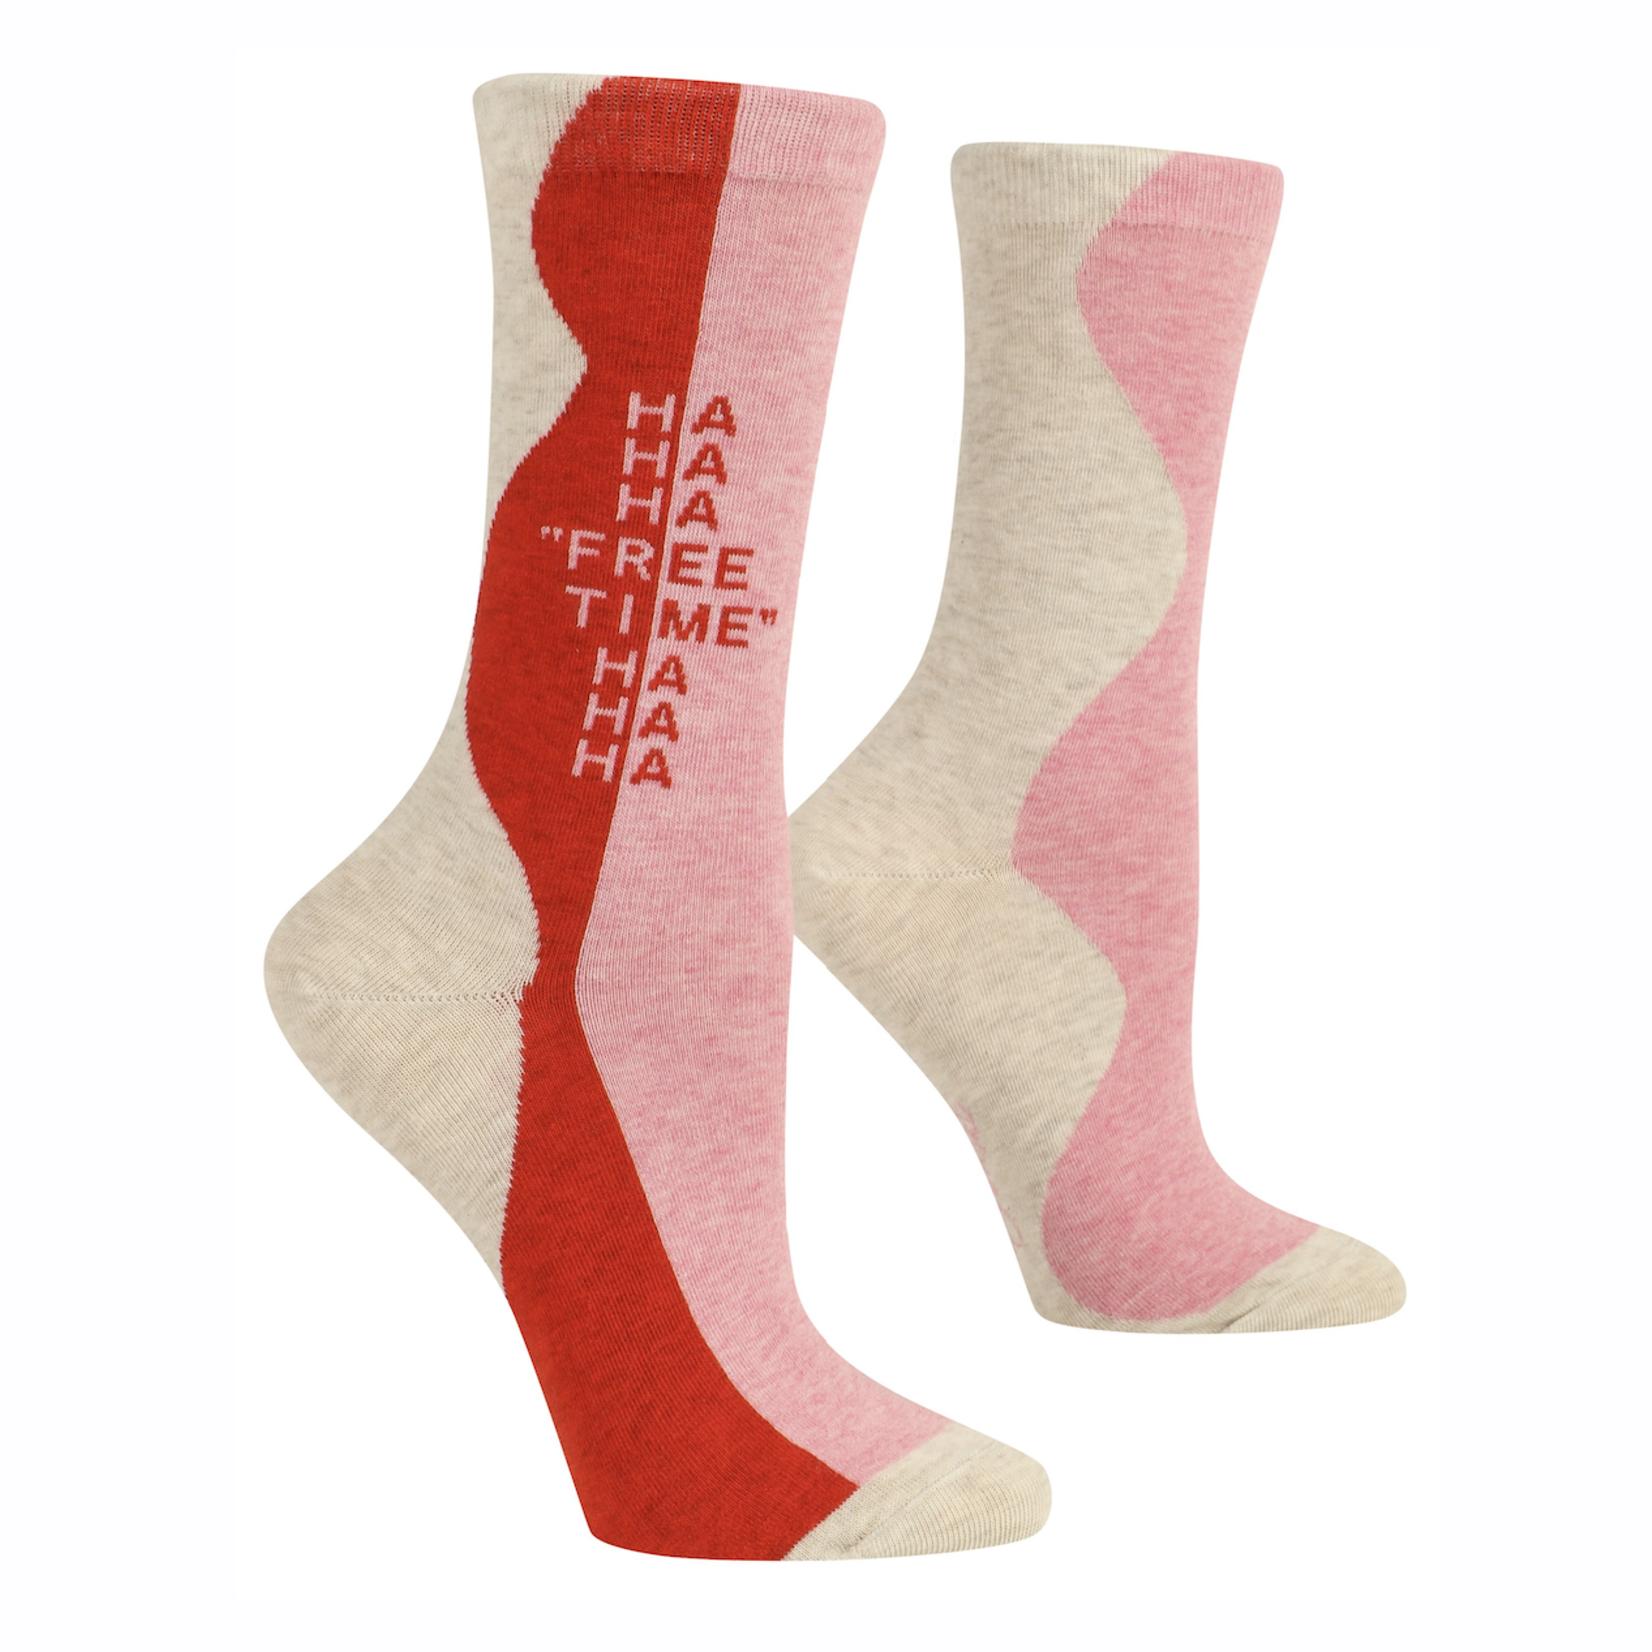 Free Time Women's Crew Socks